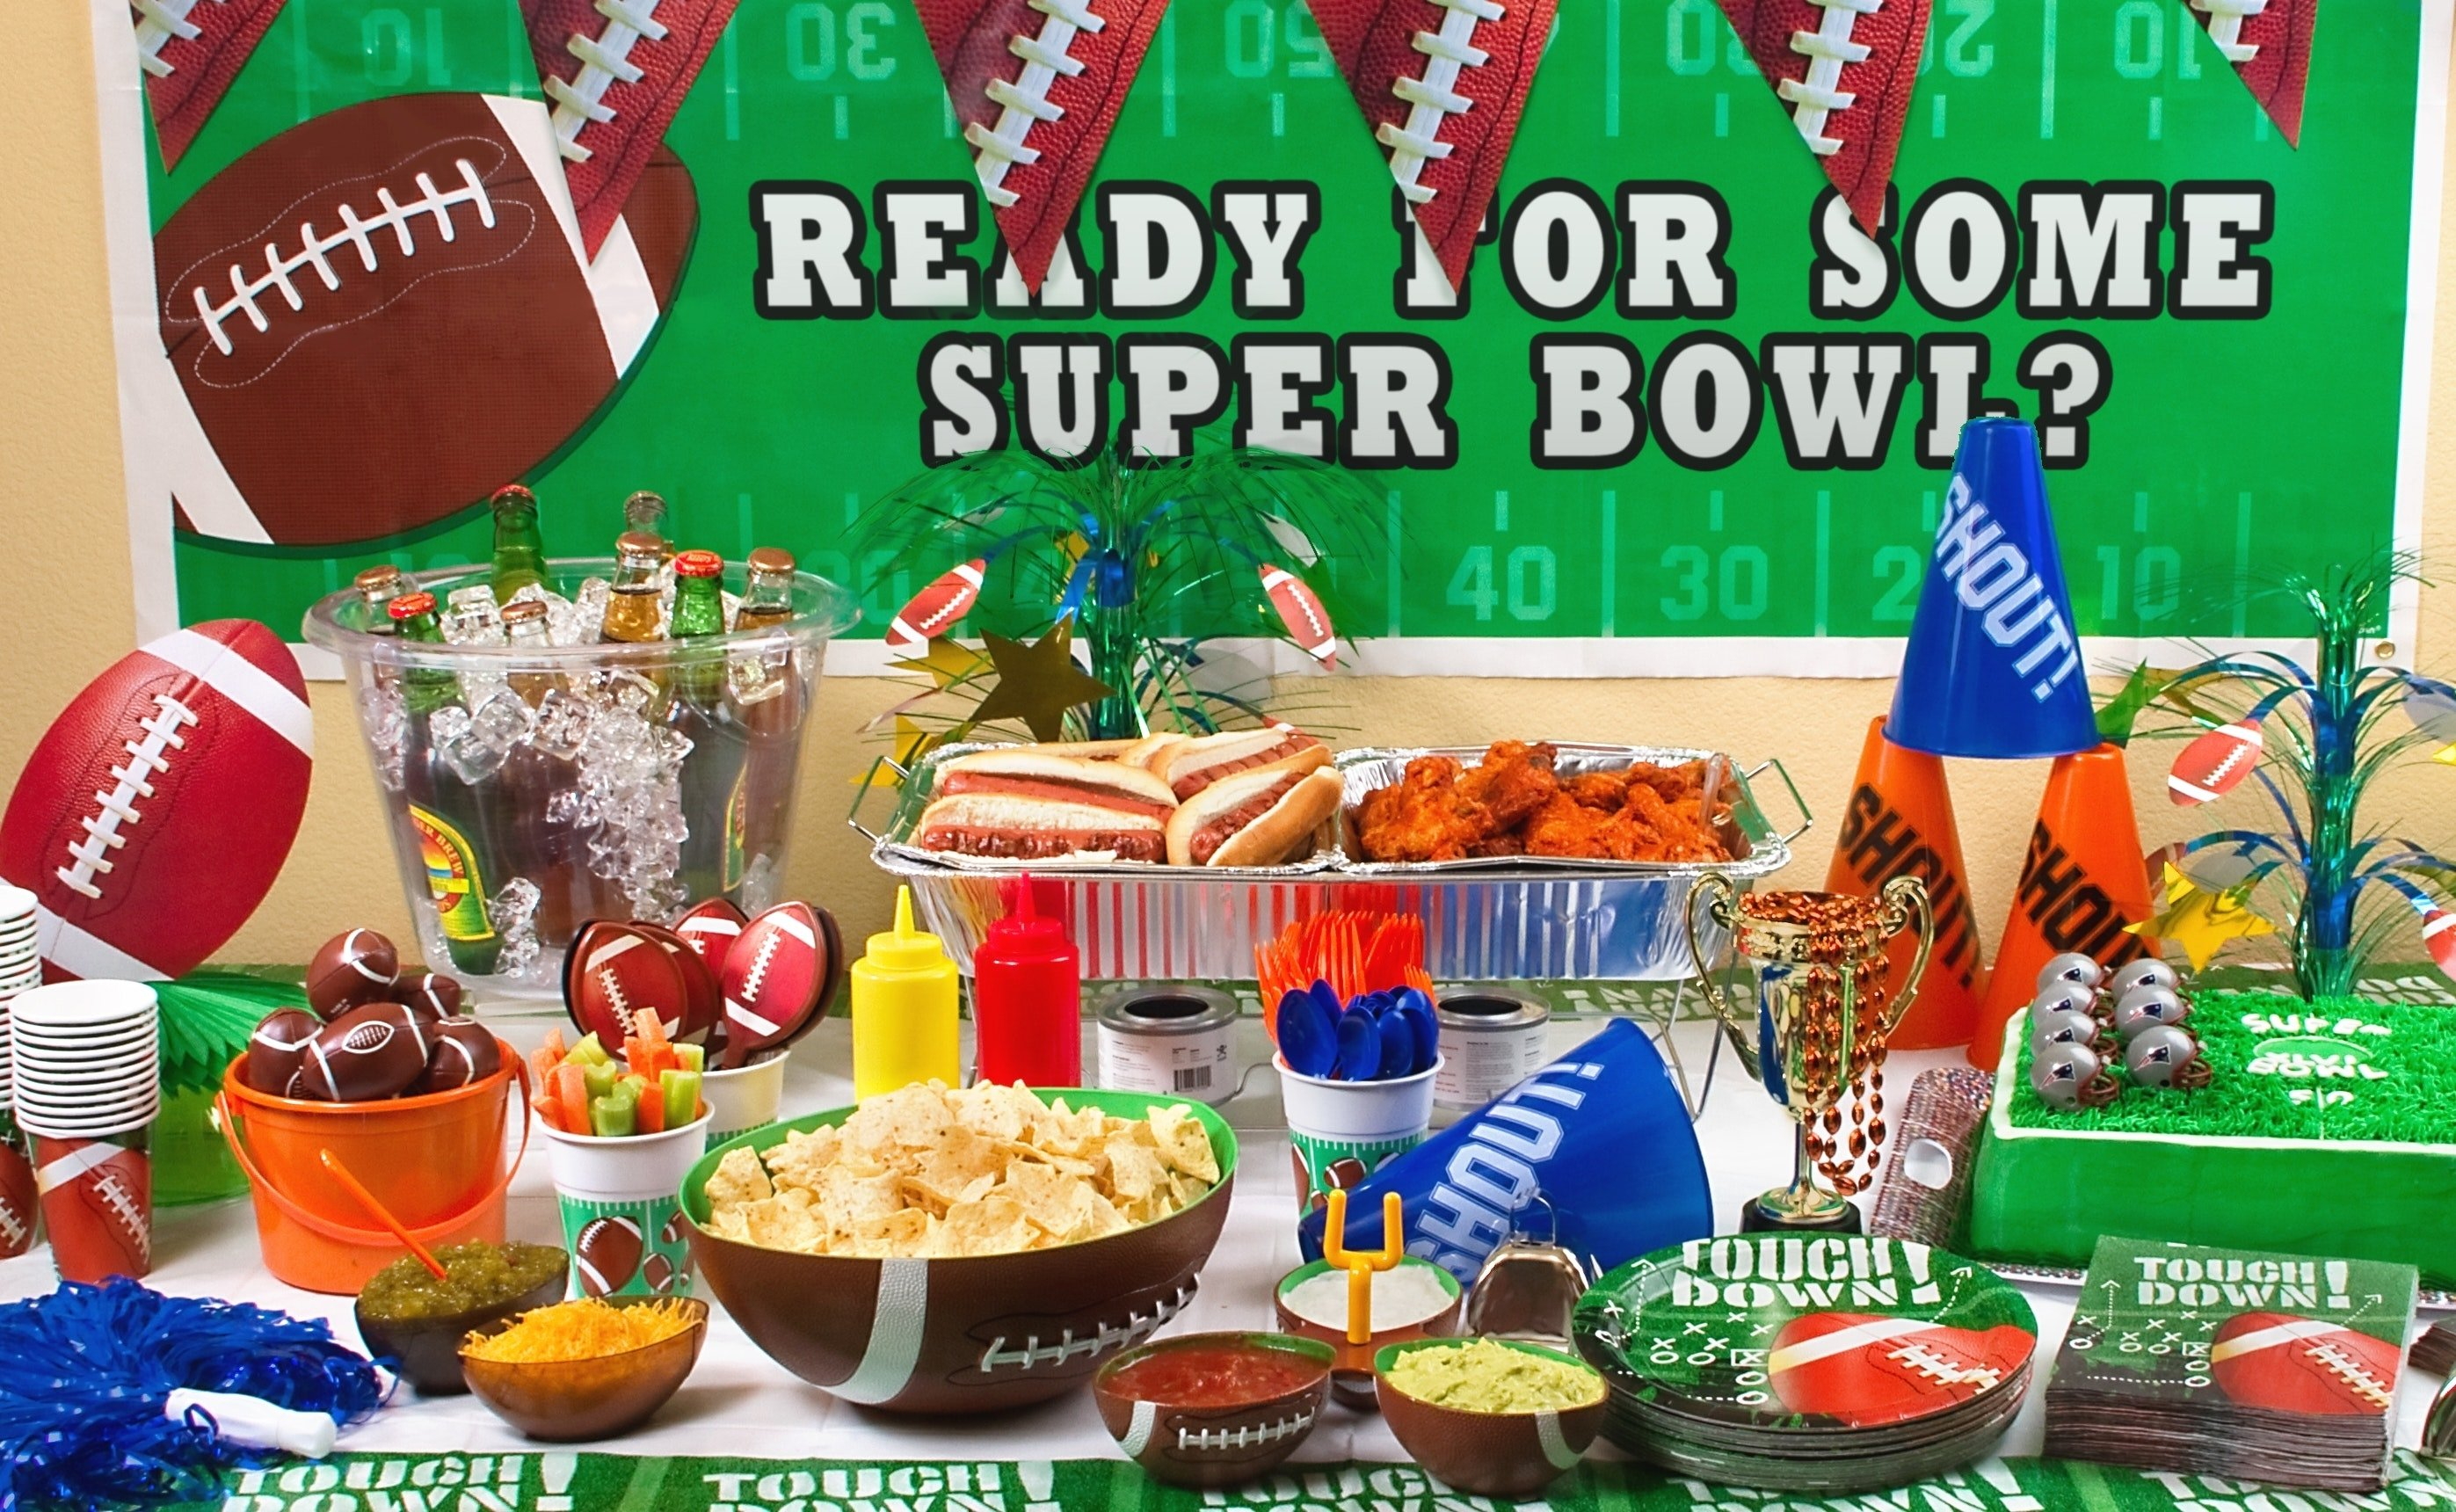 10 Amazing Super Bowl Party Decorating Ideas super bowl party decorations eye decorating ideas bowlparty abuse